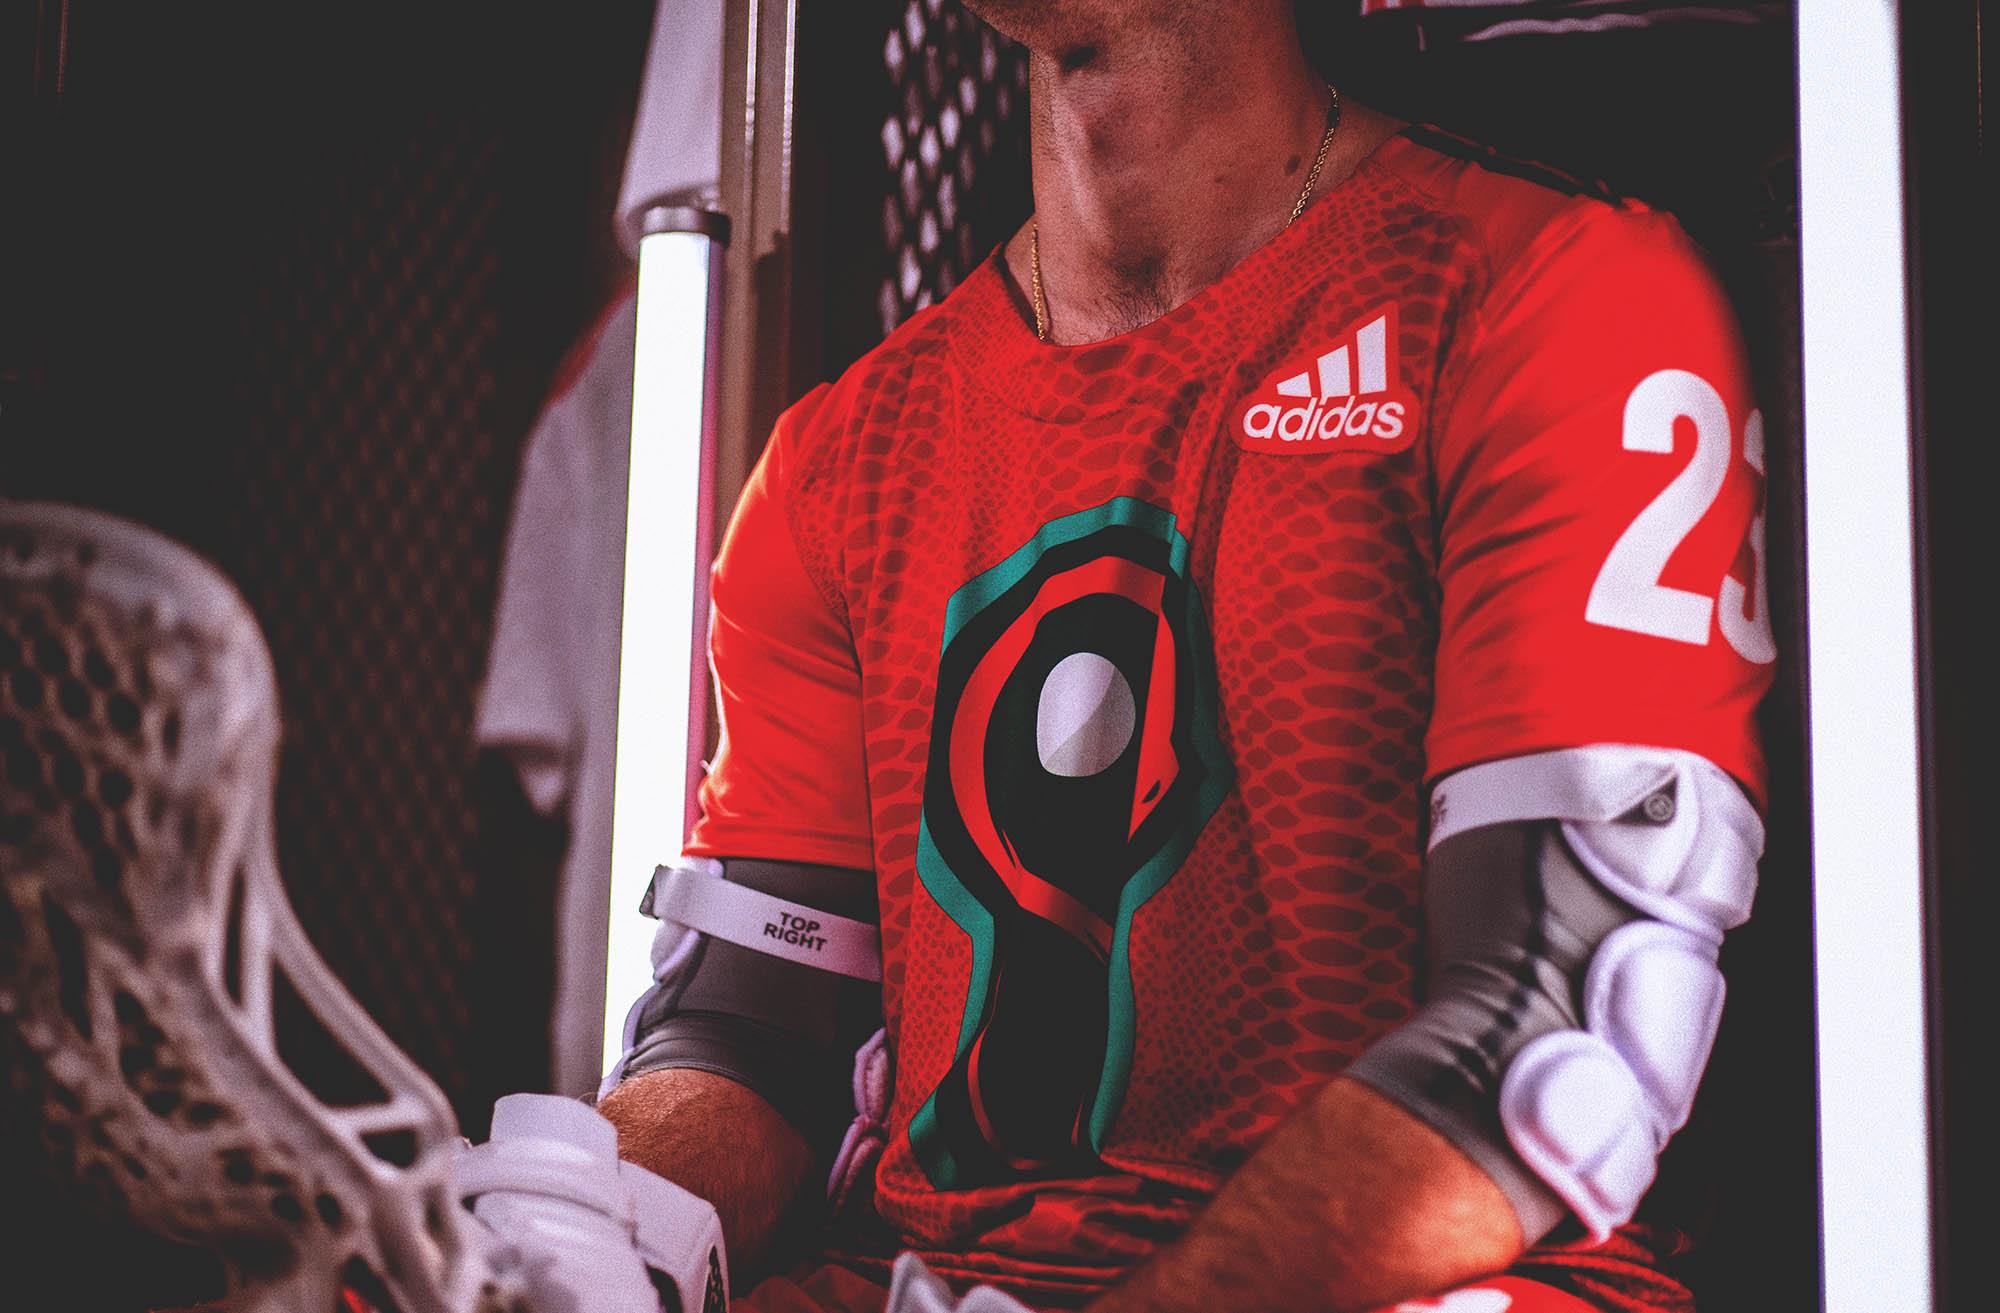 adidasLacrosse x PLL_WHIPSNAKES_02.jpg